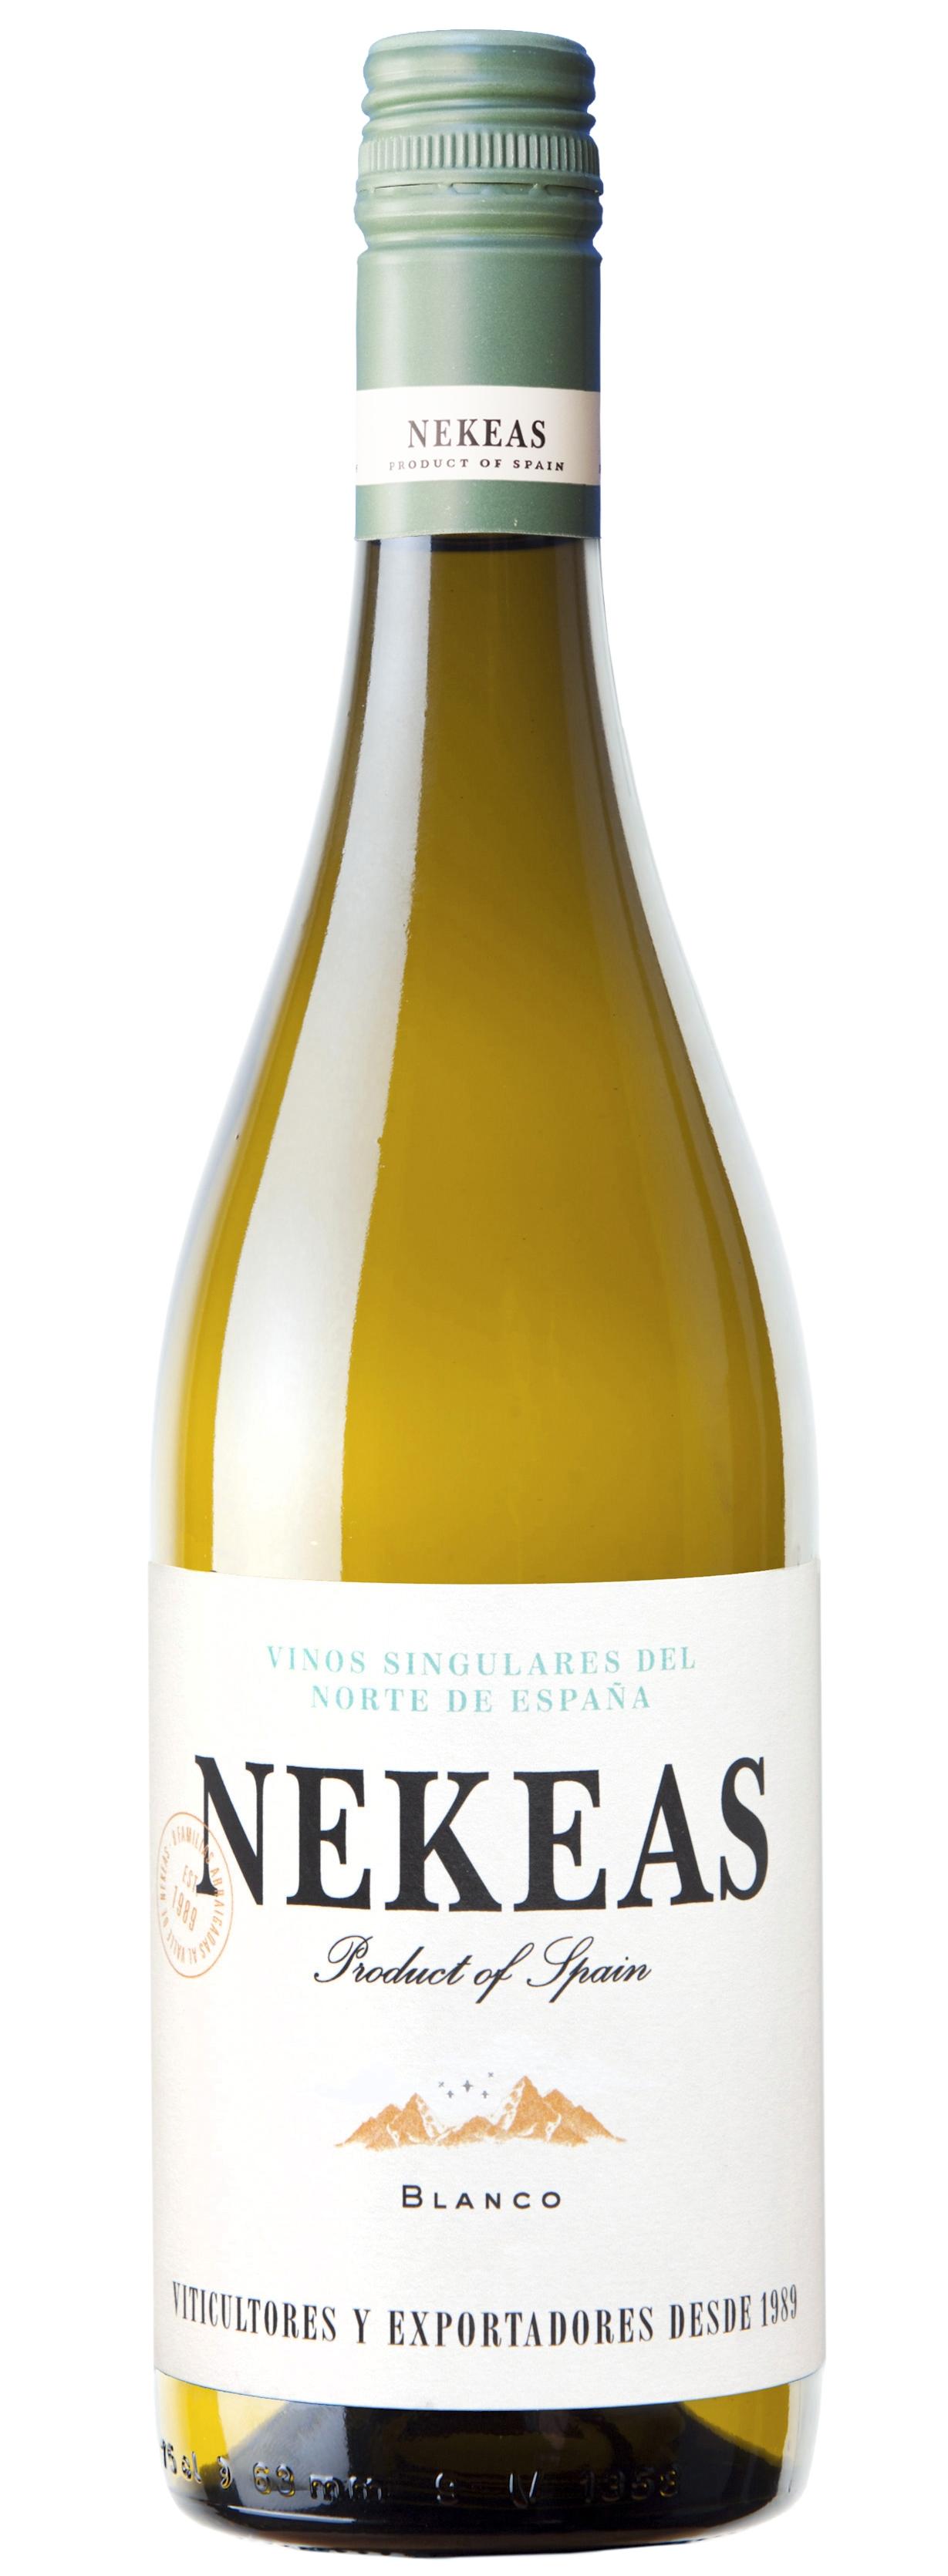 2018 Nekeas Blanco Chardonnay Viura DO